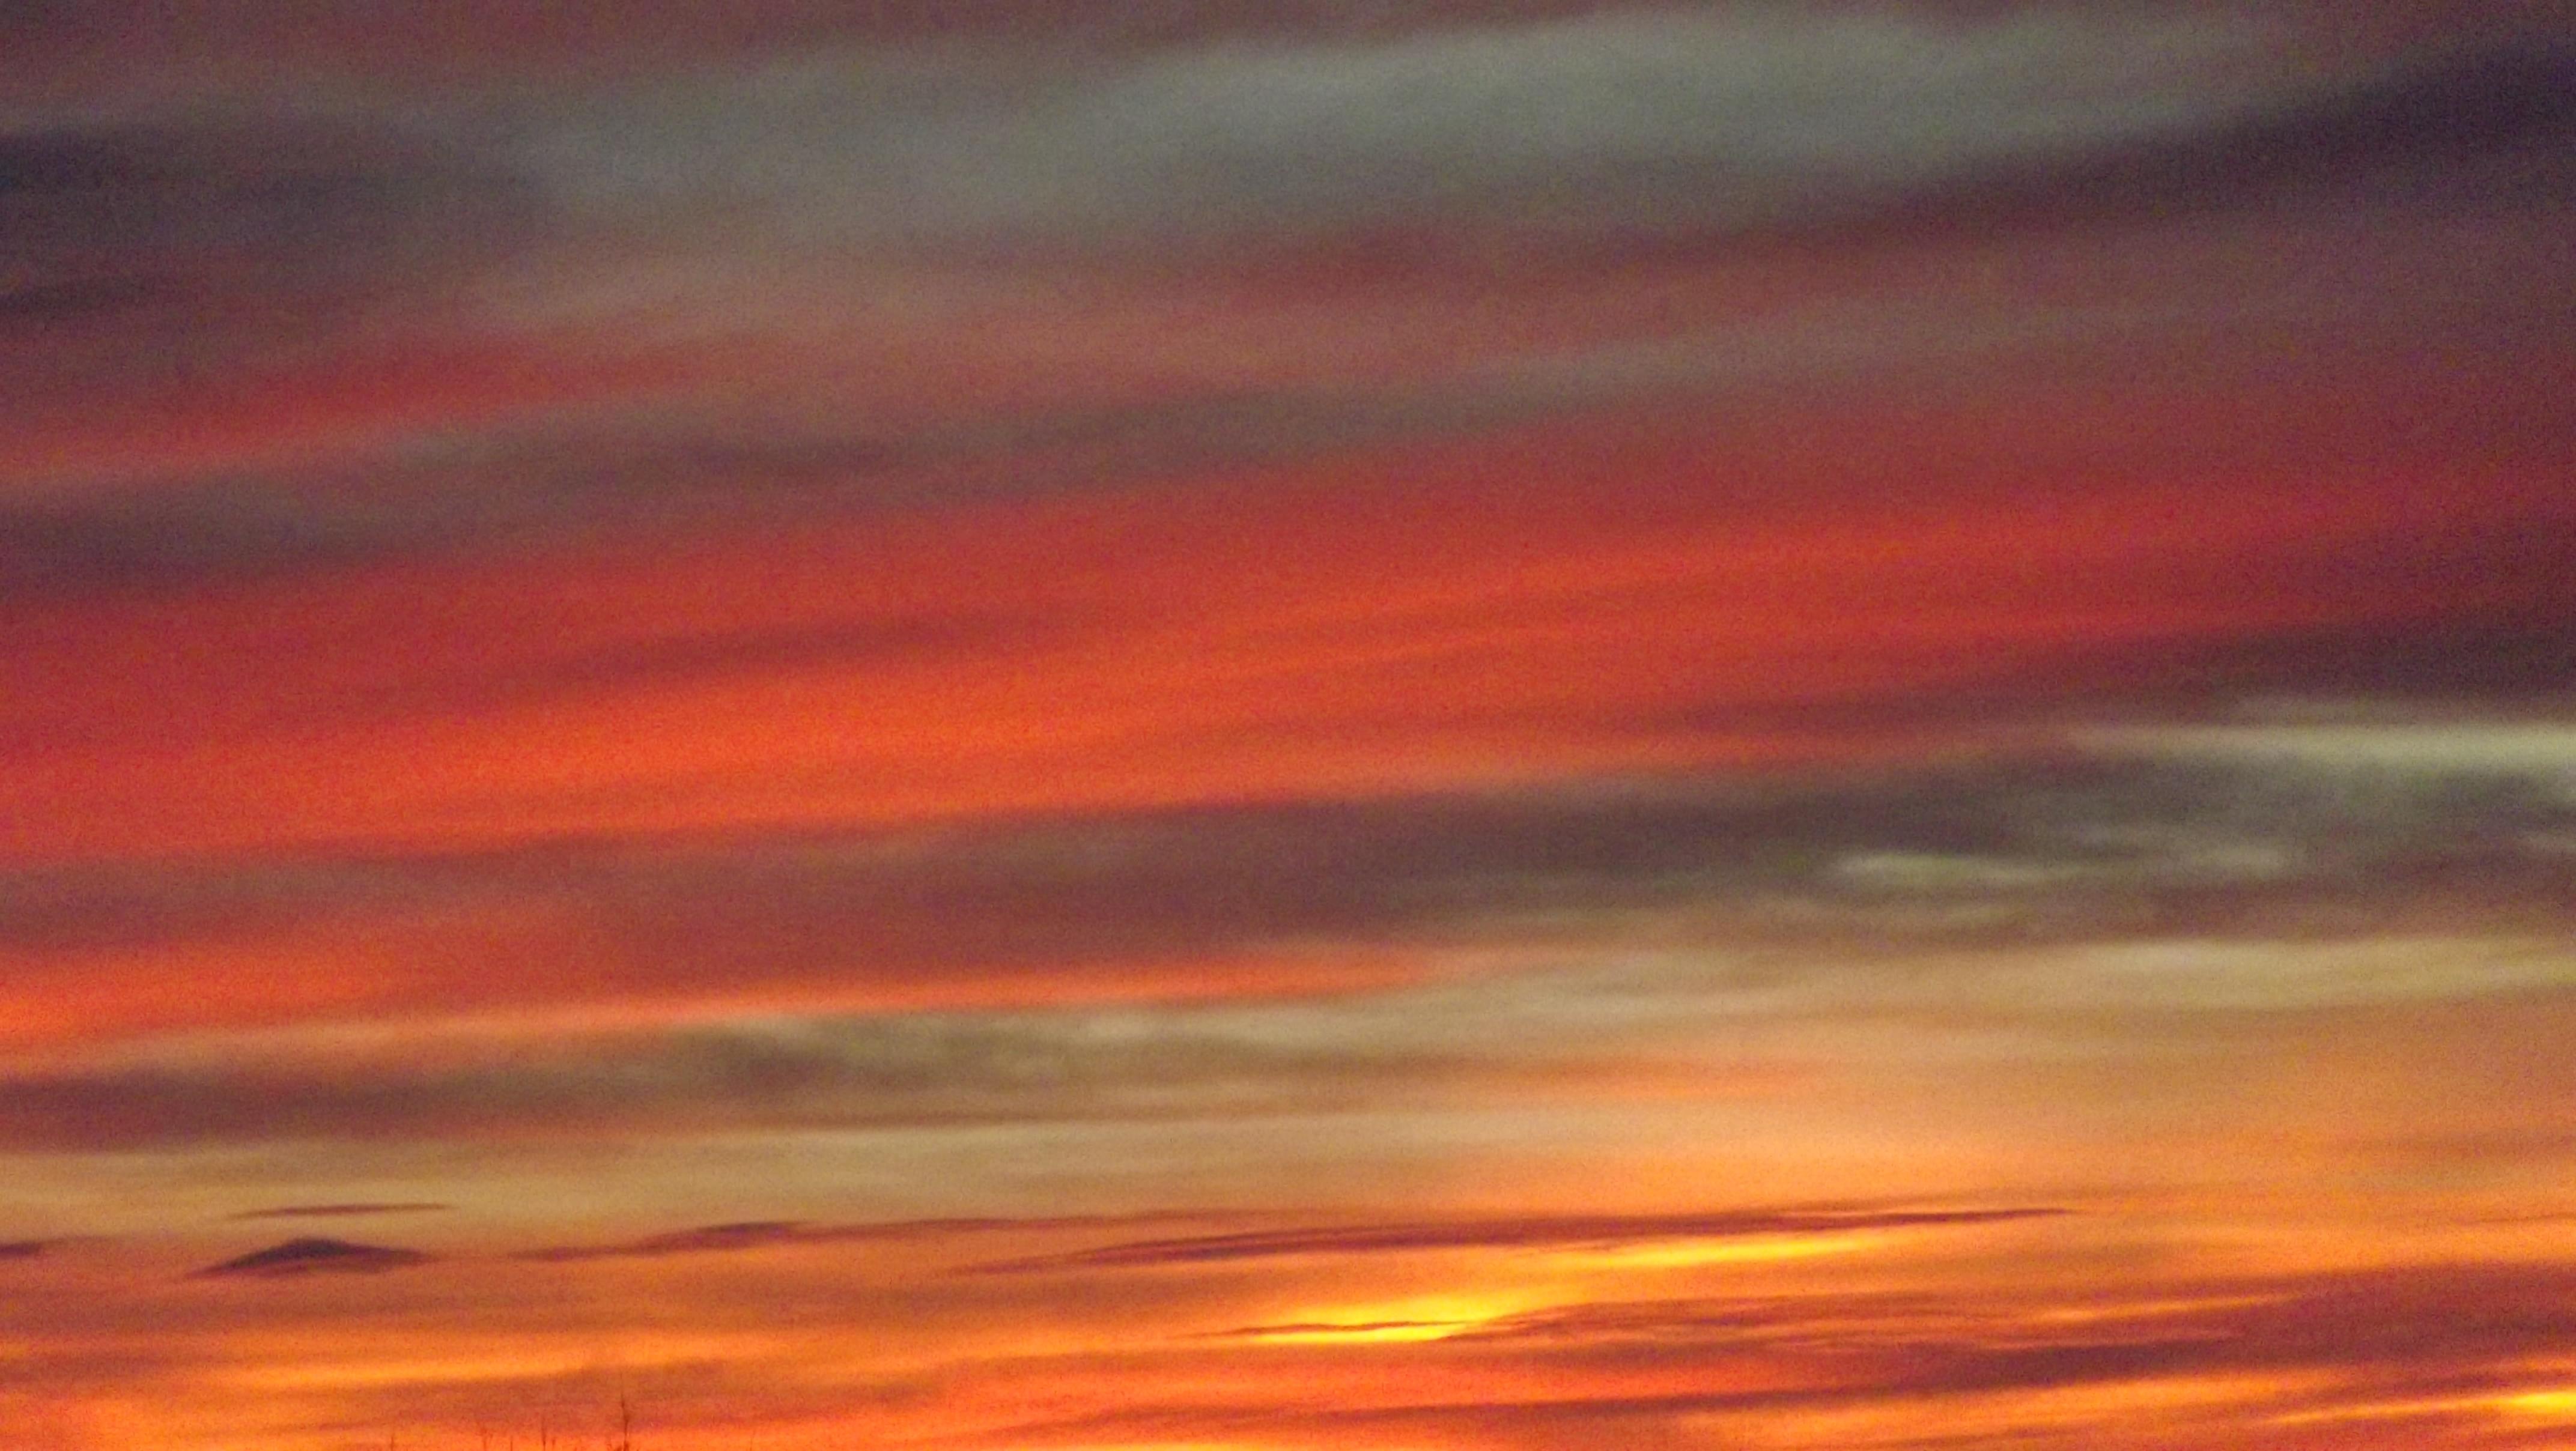 Sky Fire by GwillaTheDragon